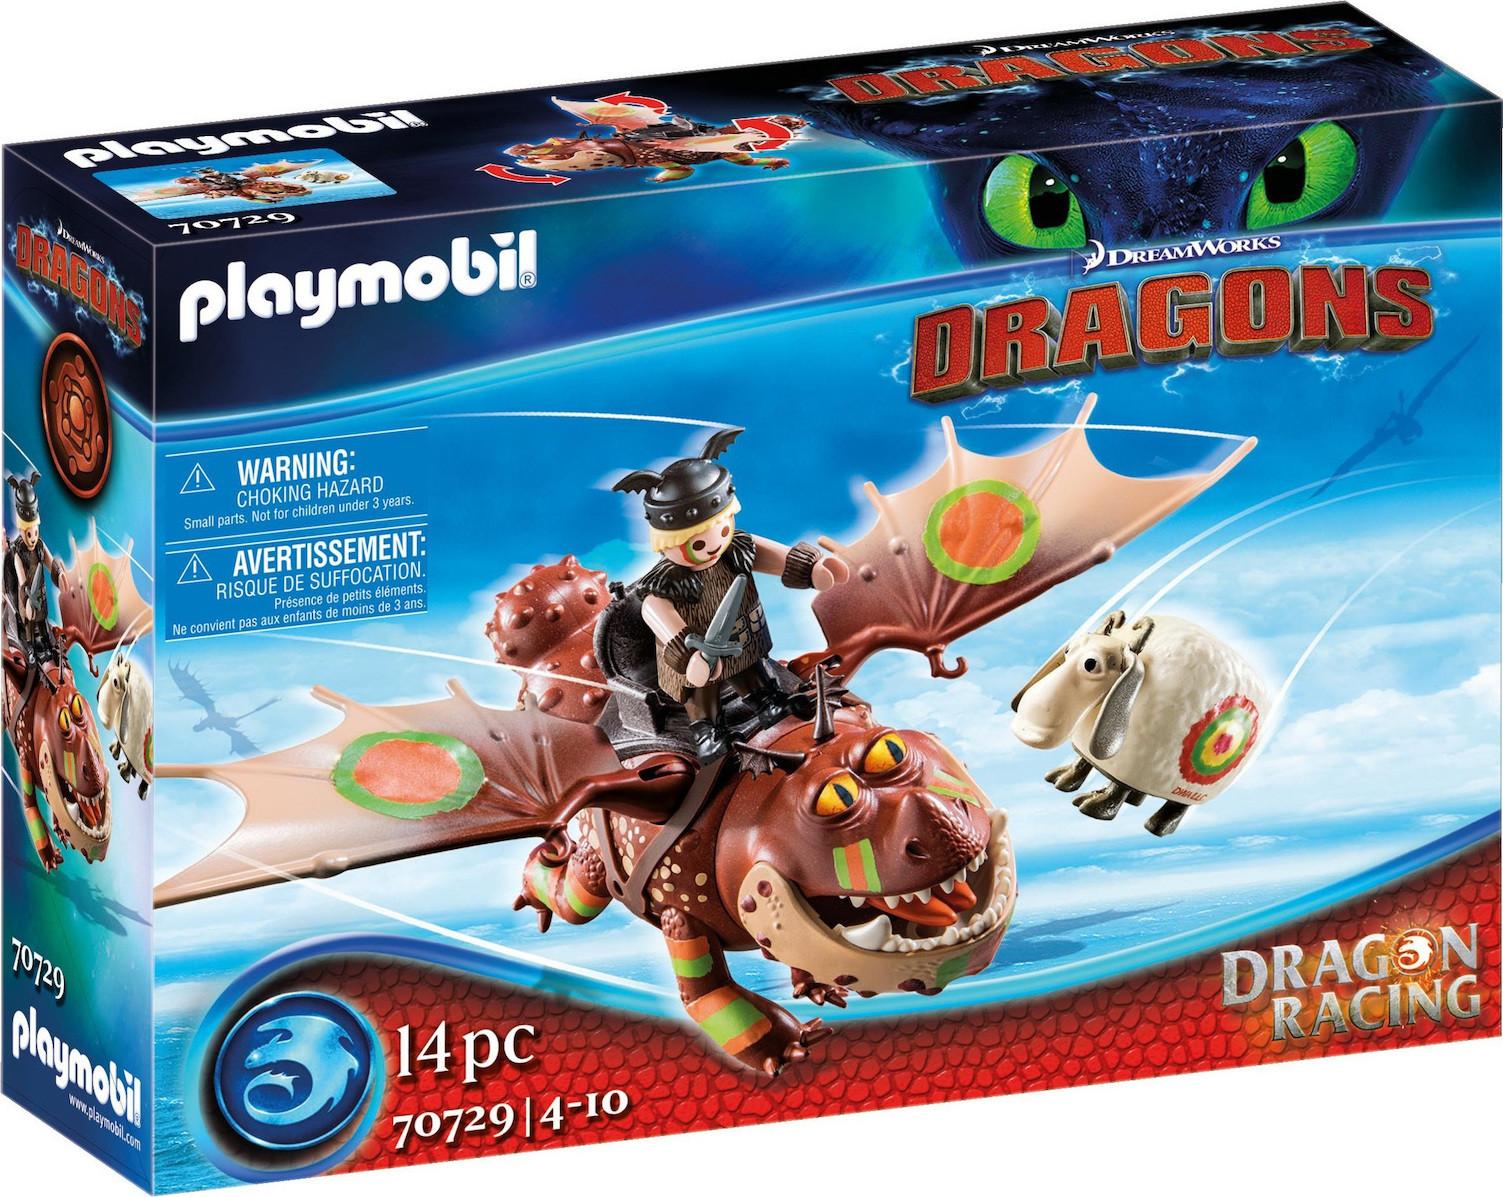 Playmobil Dragons ΛΕΠΙΑΣ ΚΑΙ ΧΟΝΤΡΟΚΕΦΑΛΟΣ (70729)